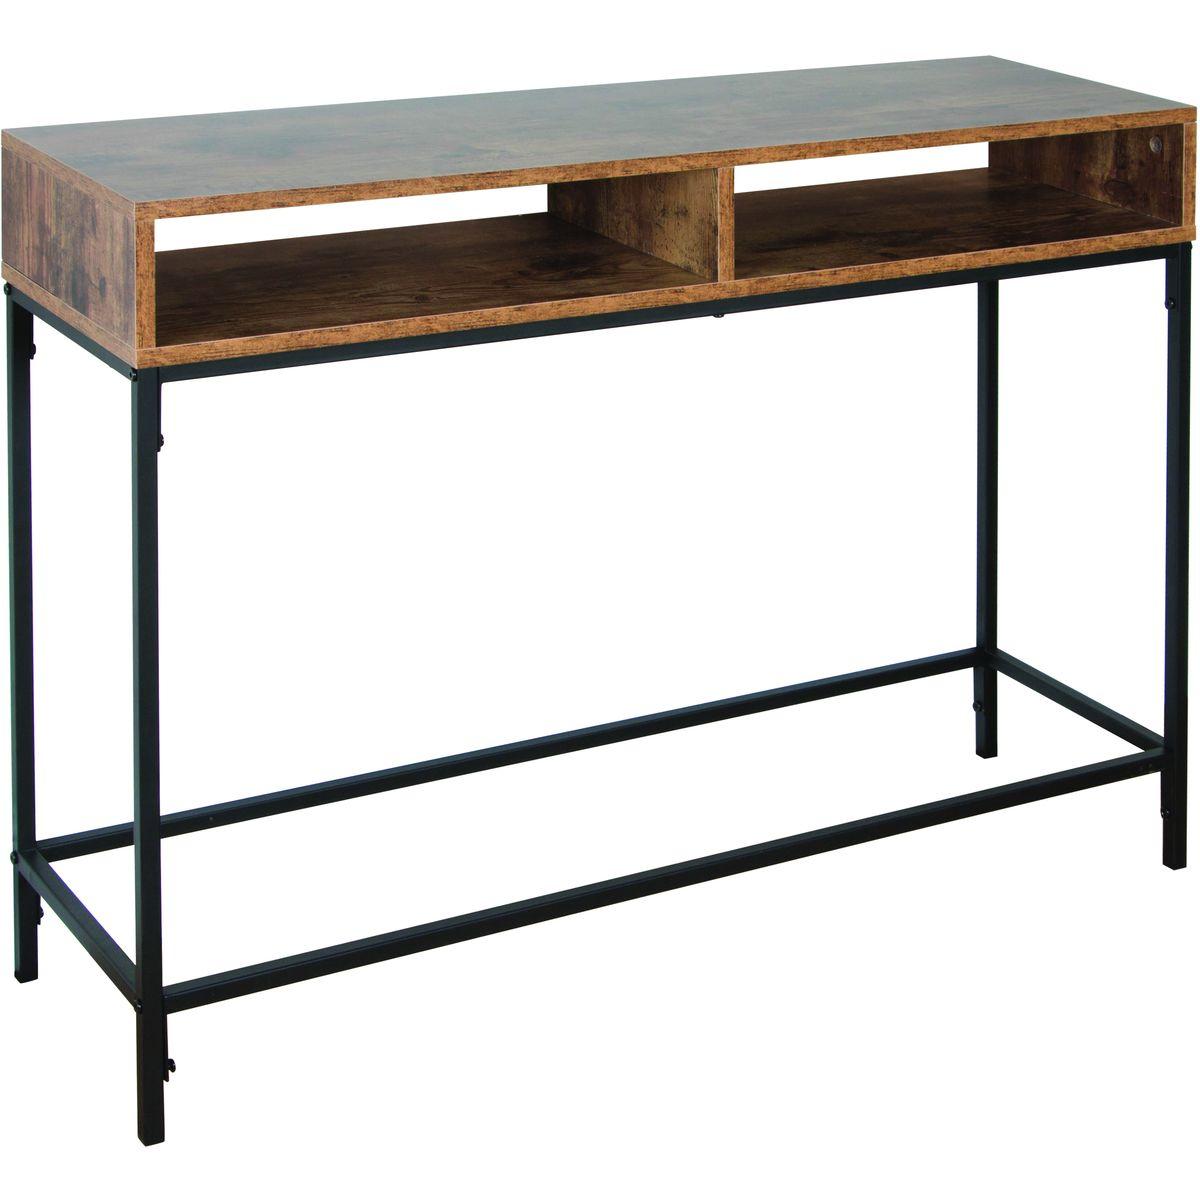 online retailer 39e84 a3fca BigW - Colorado Console Table - $49 - Dimensions: 75cm (H) x ...